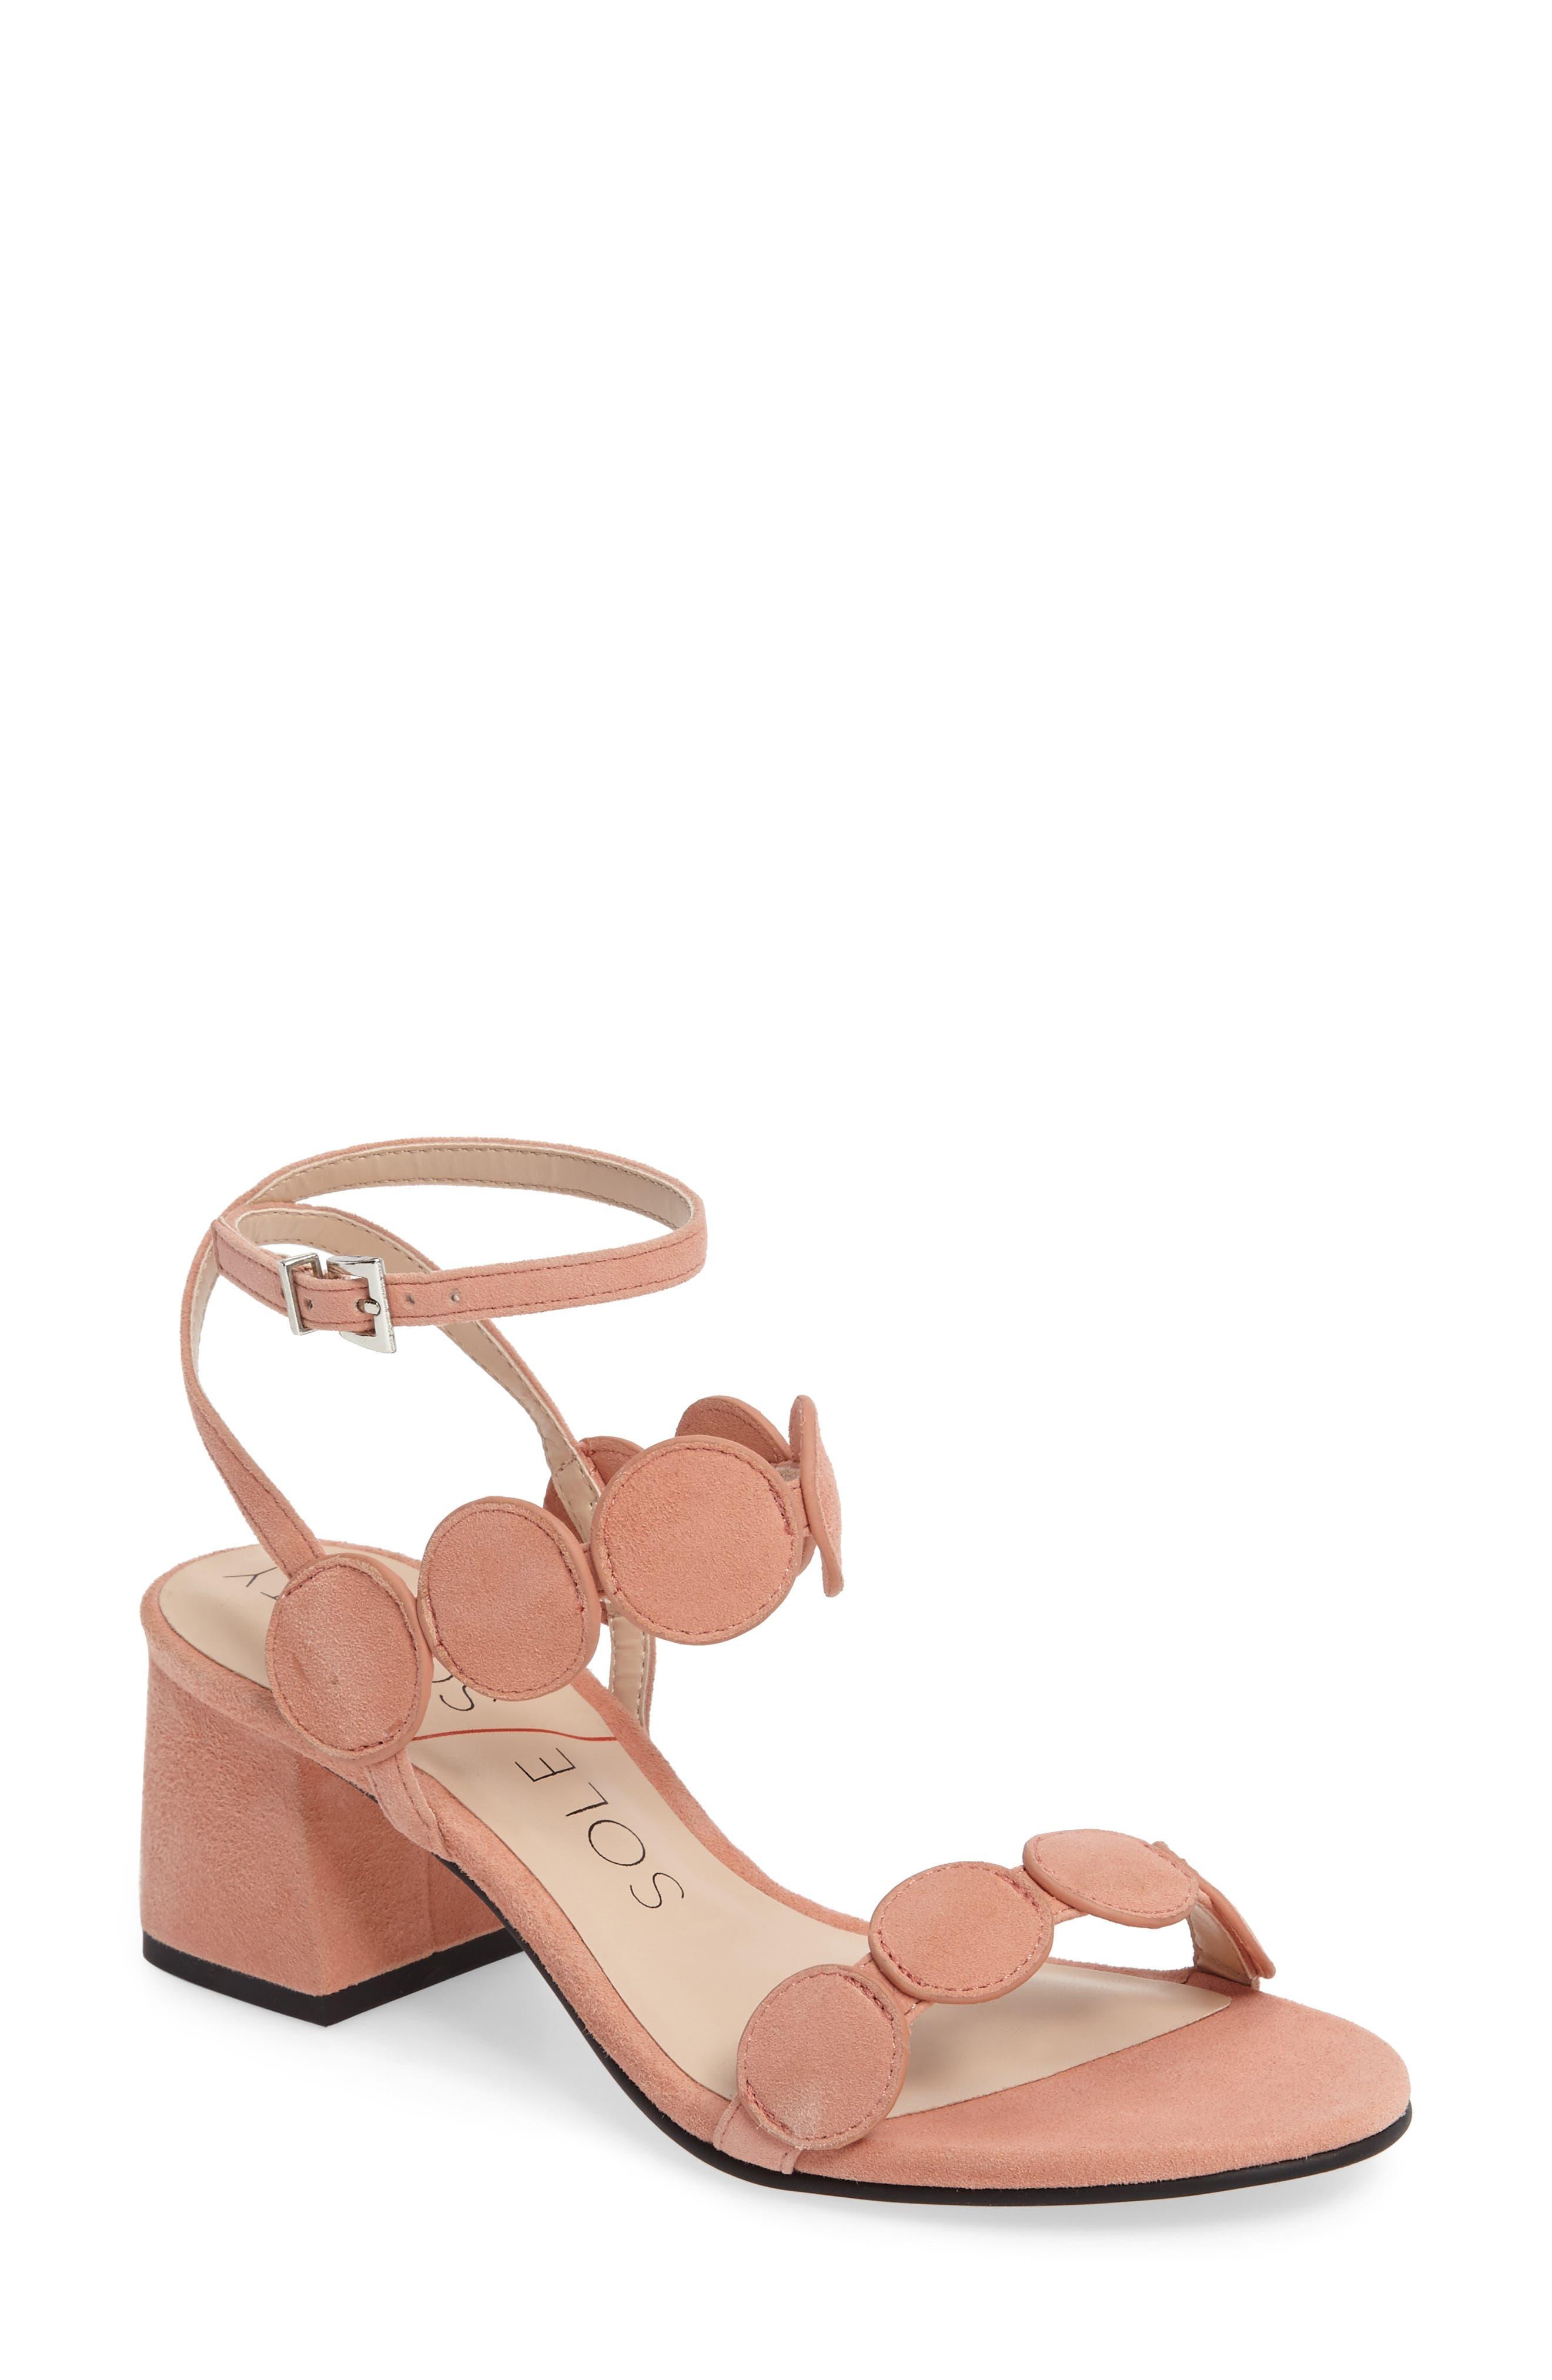 Shea Block Heel Sandal,                             Main thumbnail 6, color,